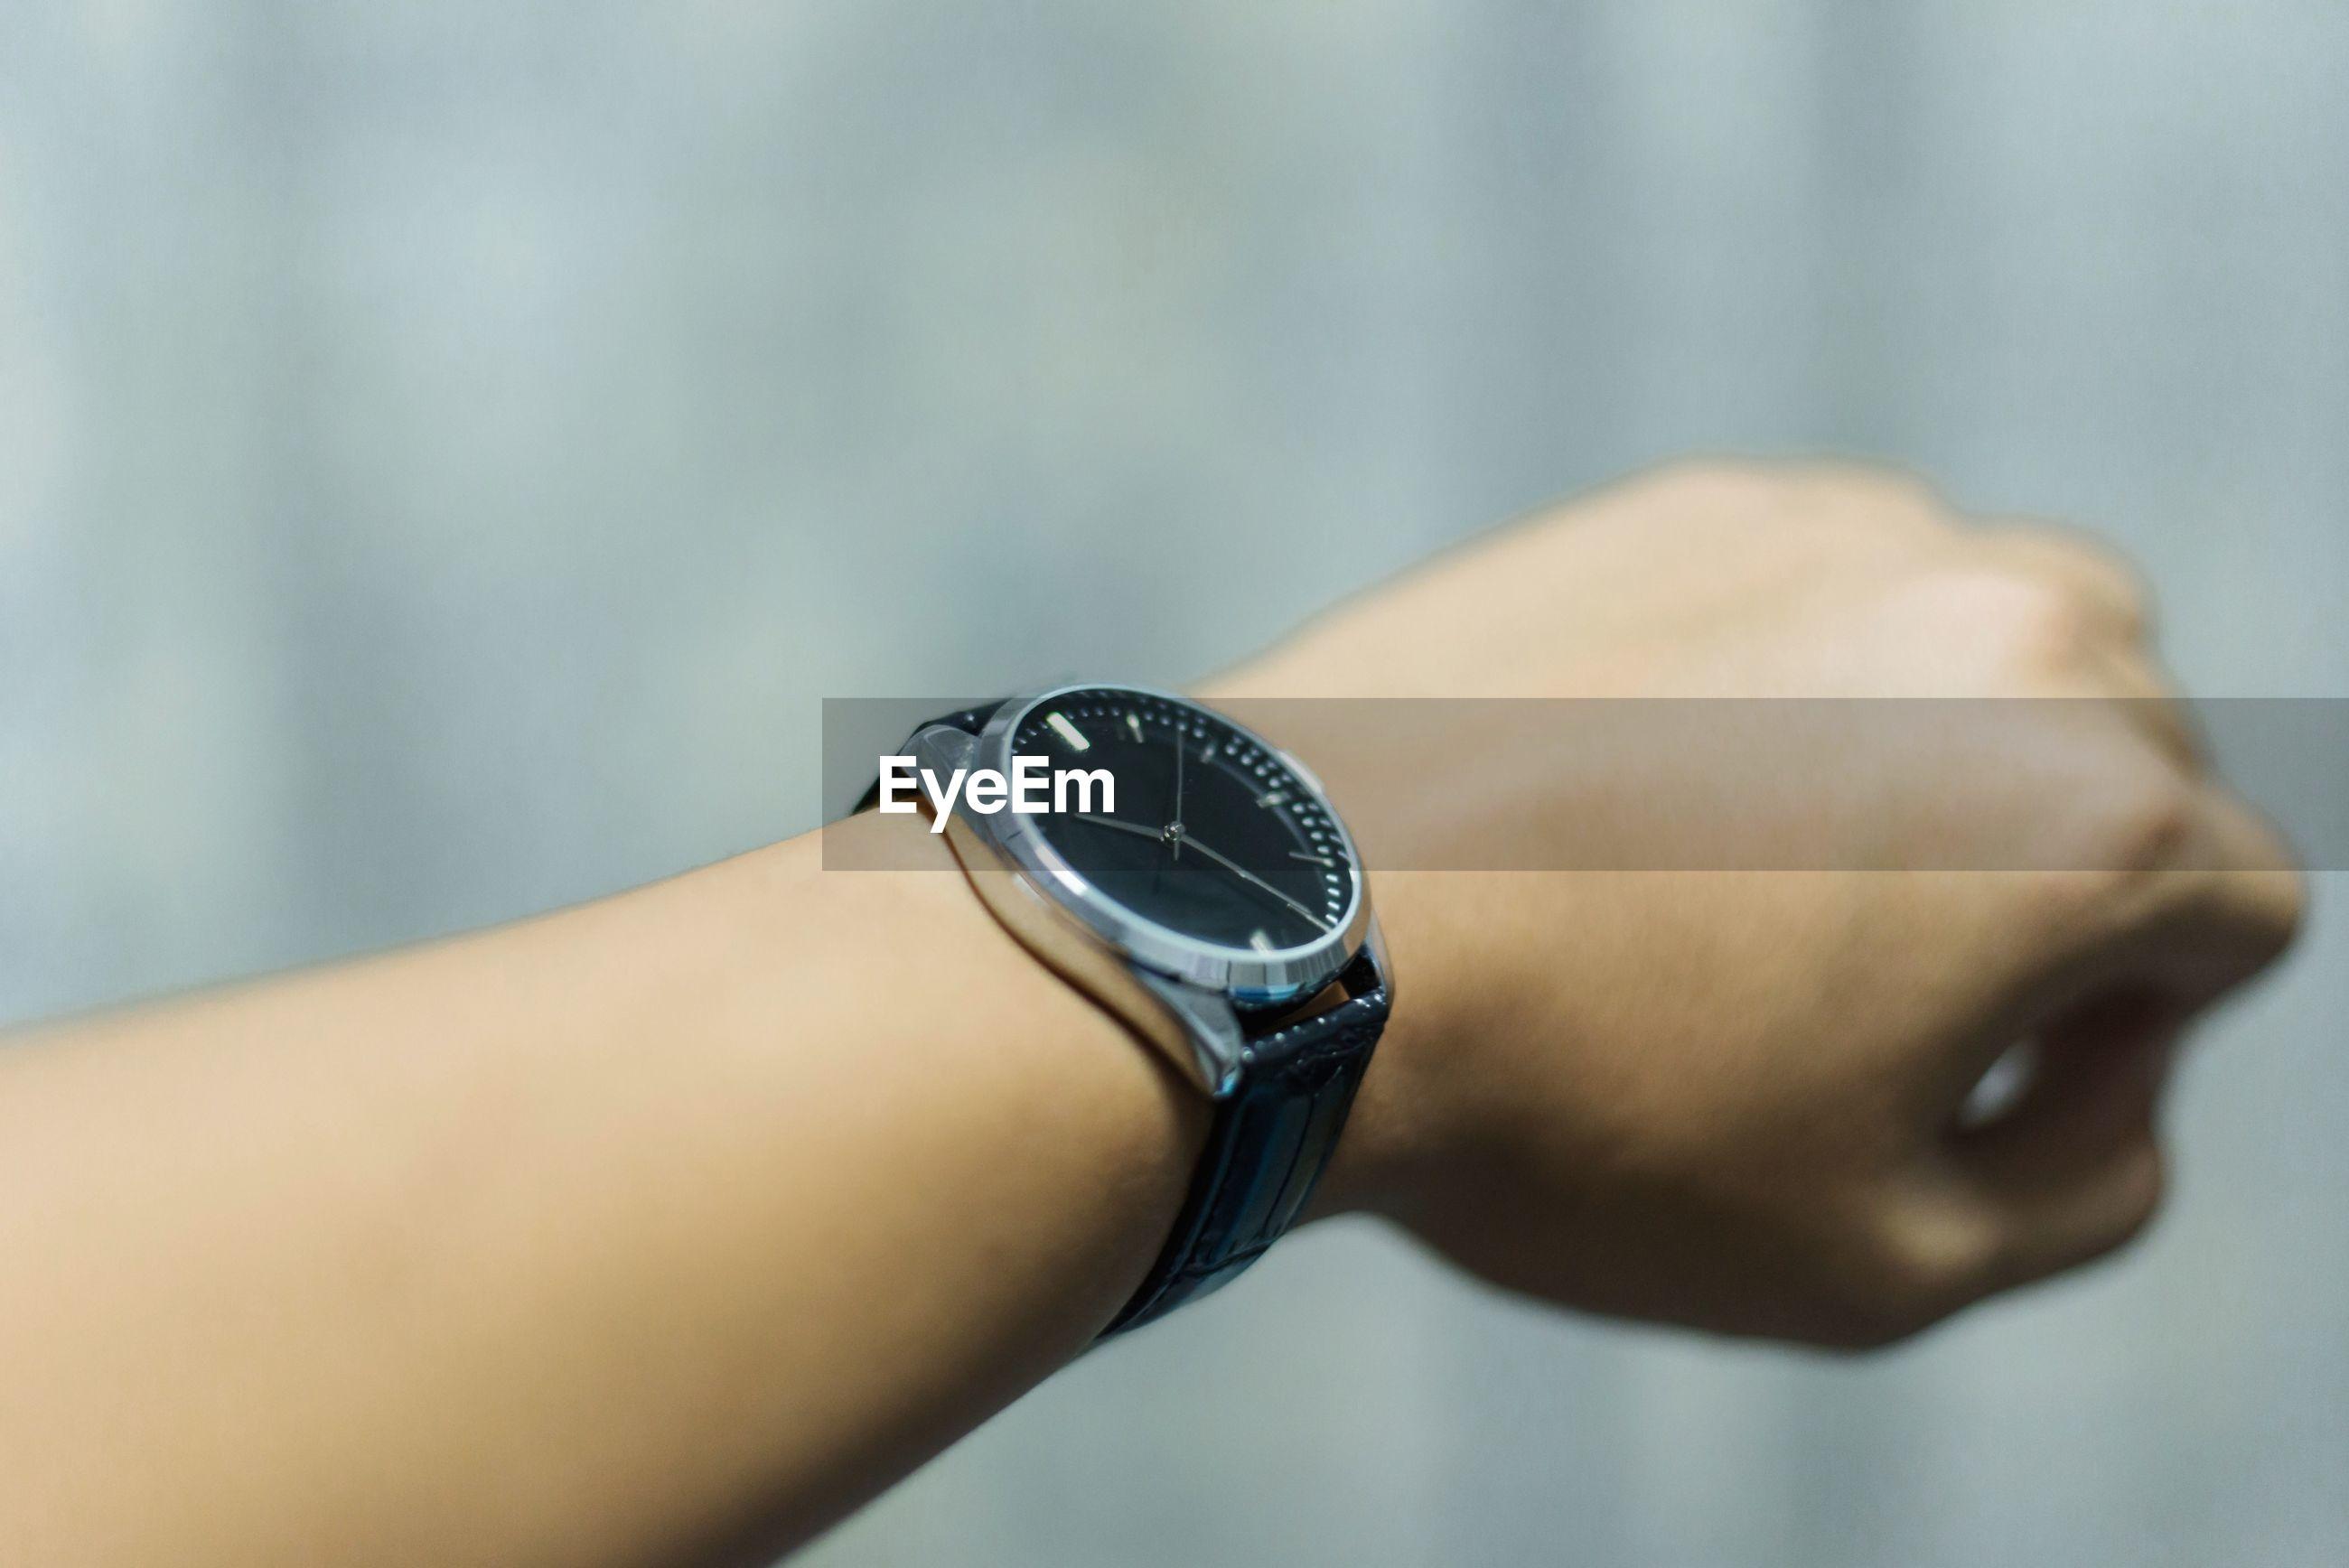 Cropped hand wearing wristwatch